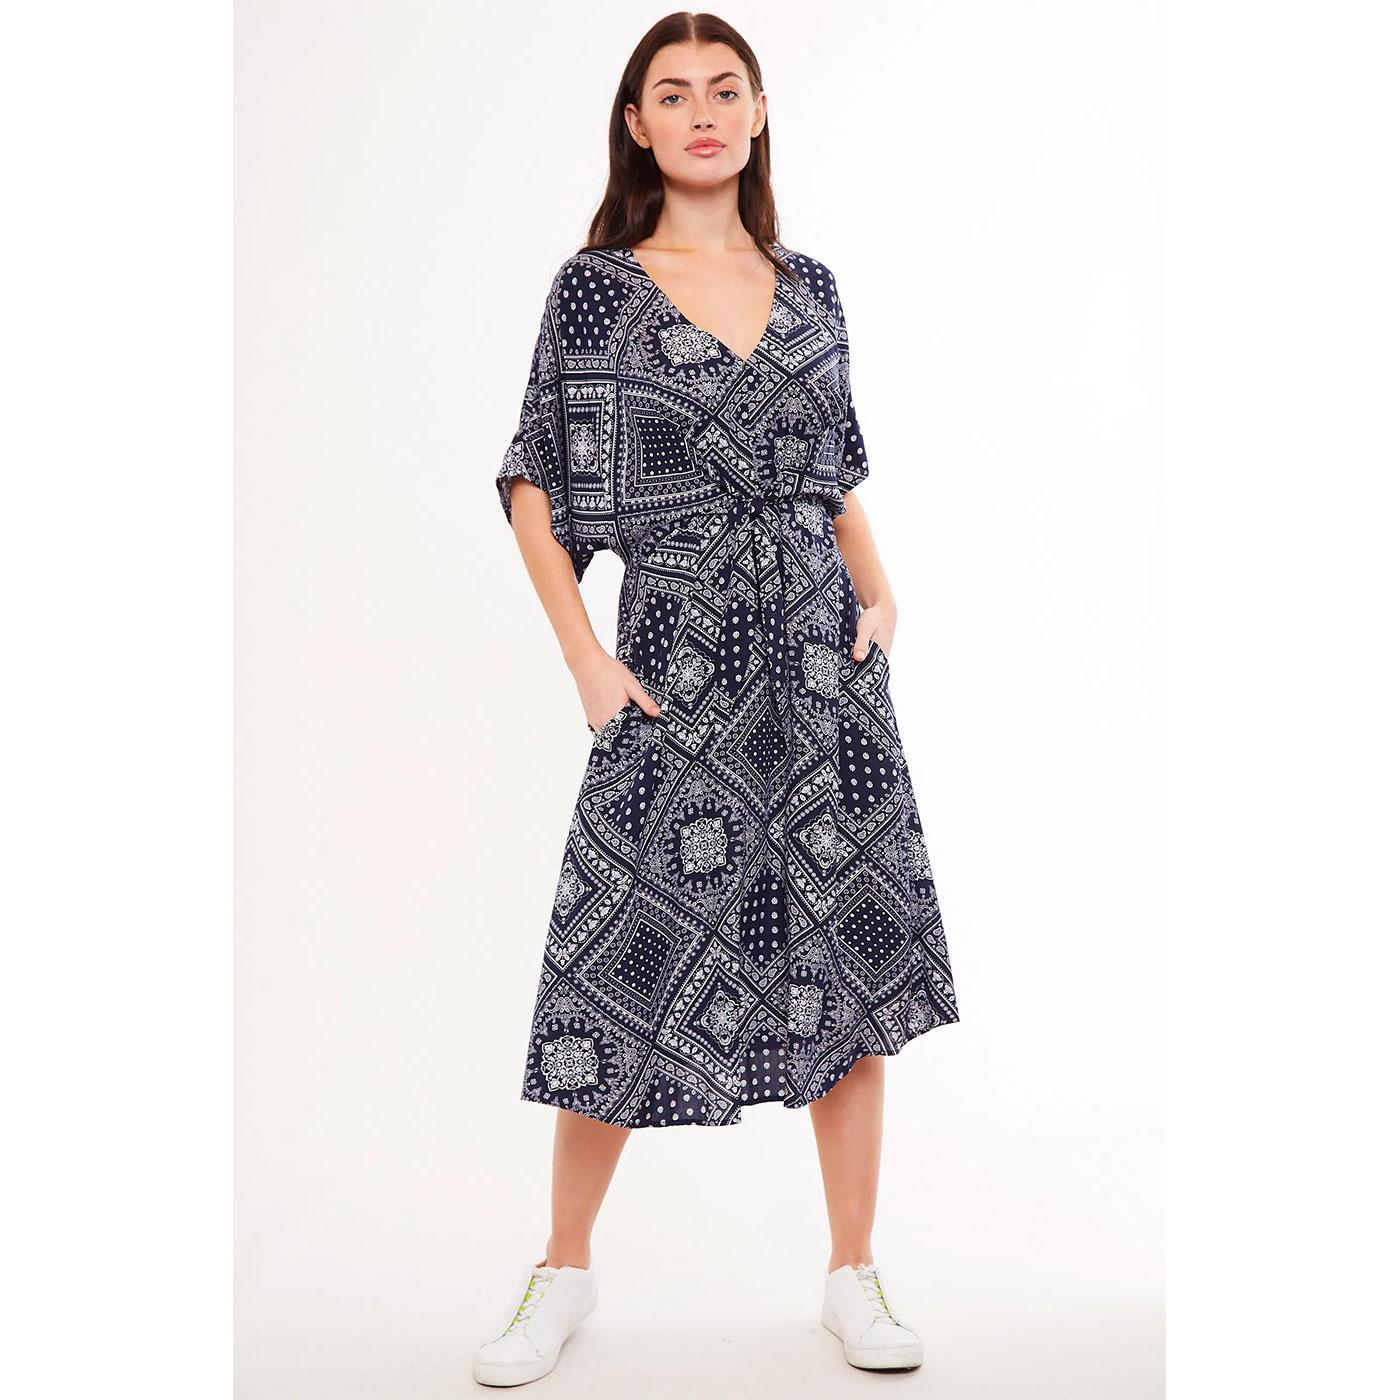 Elody LOUCHE LONDON 70s Bandana Print Midi Dress